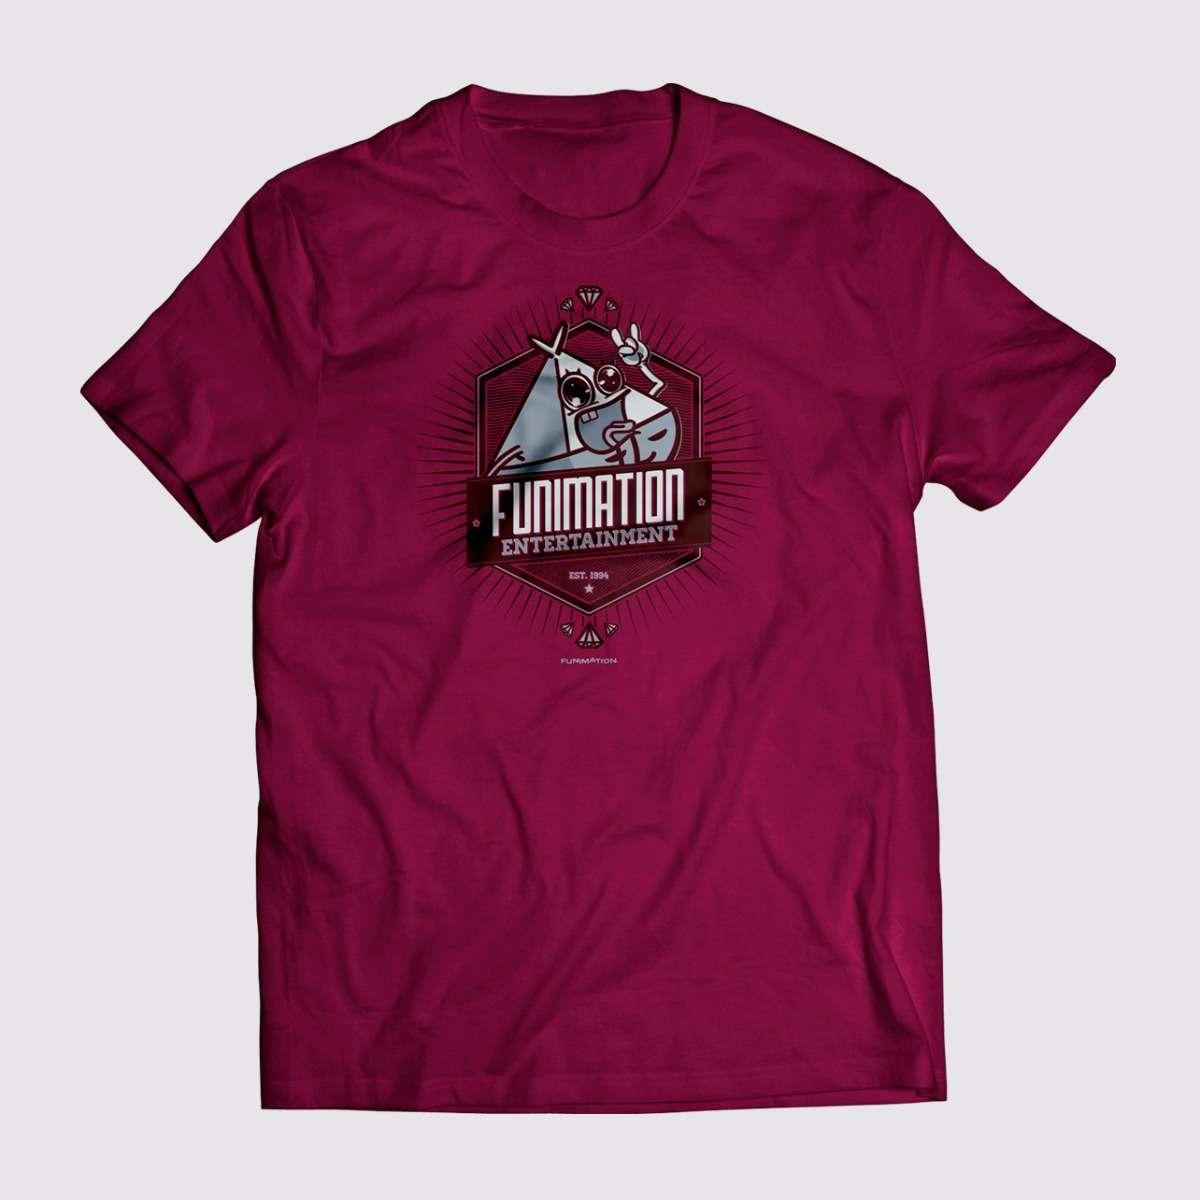 T-shirt - Maroon apparel